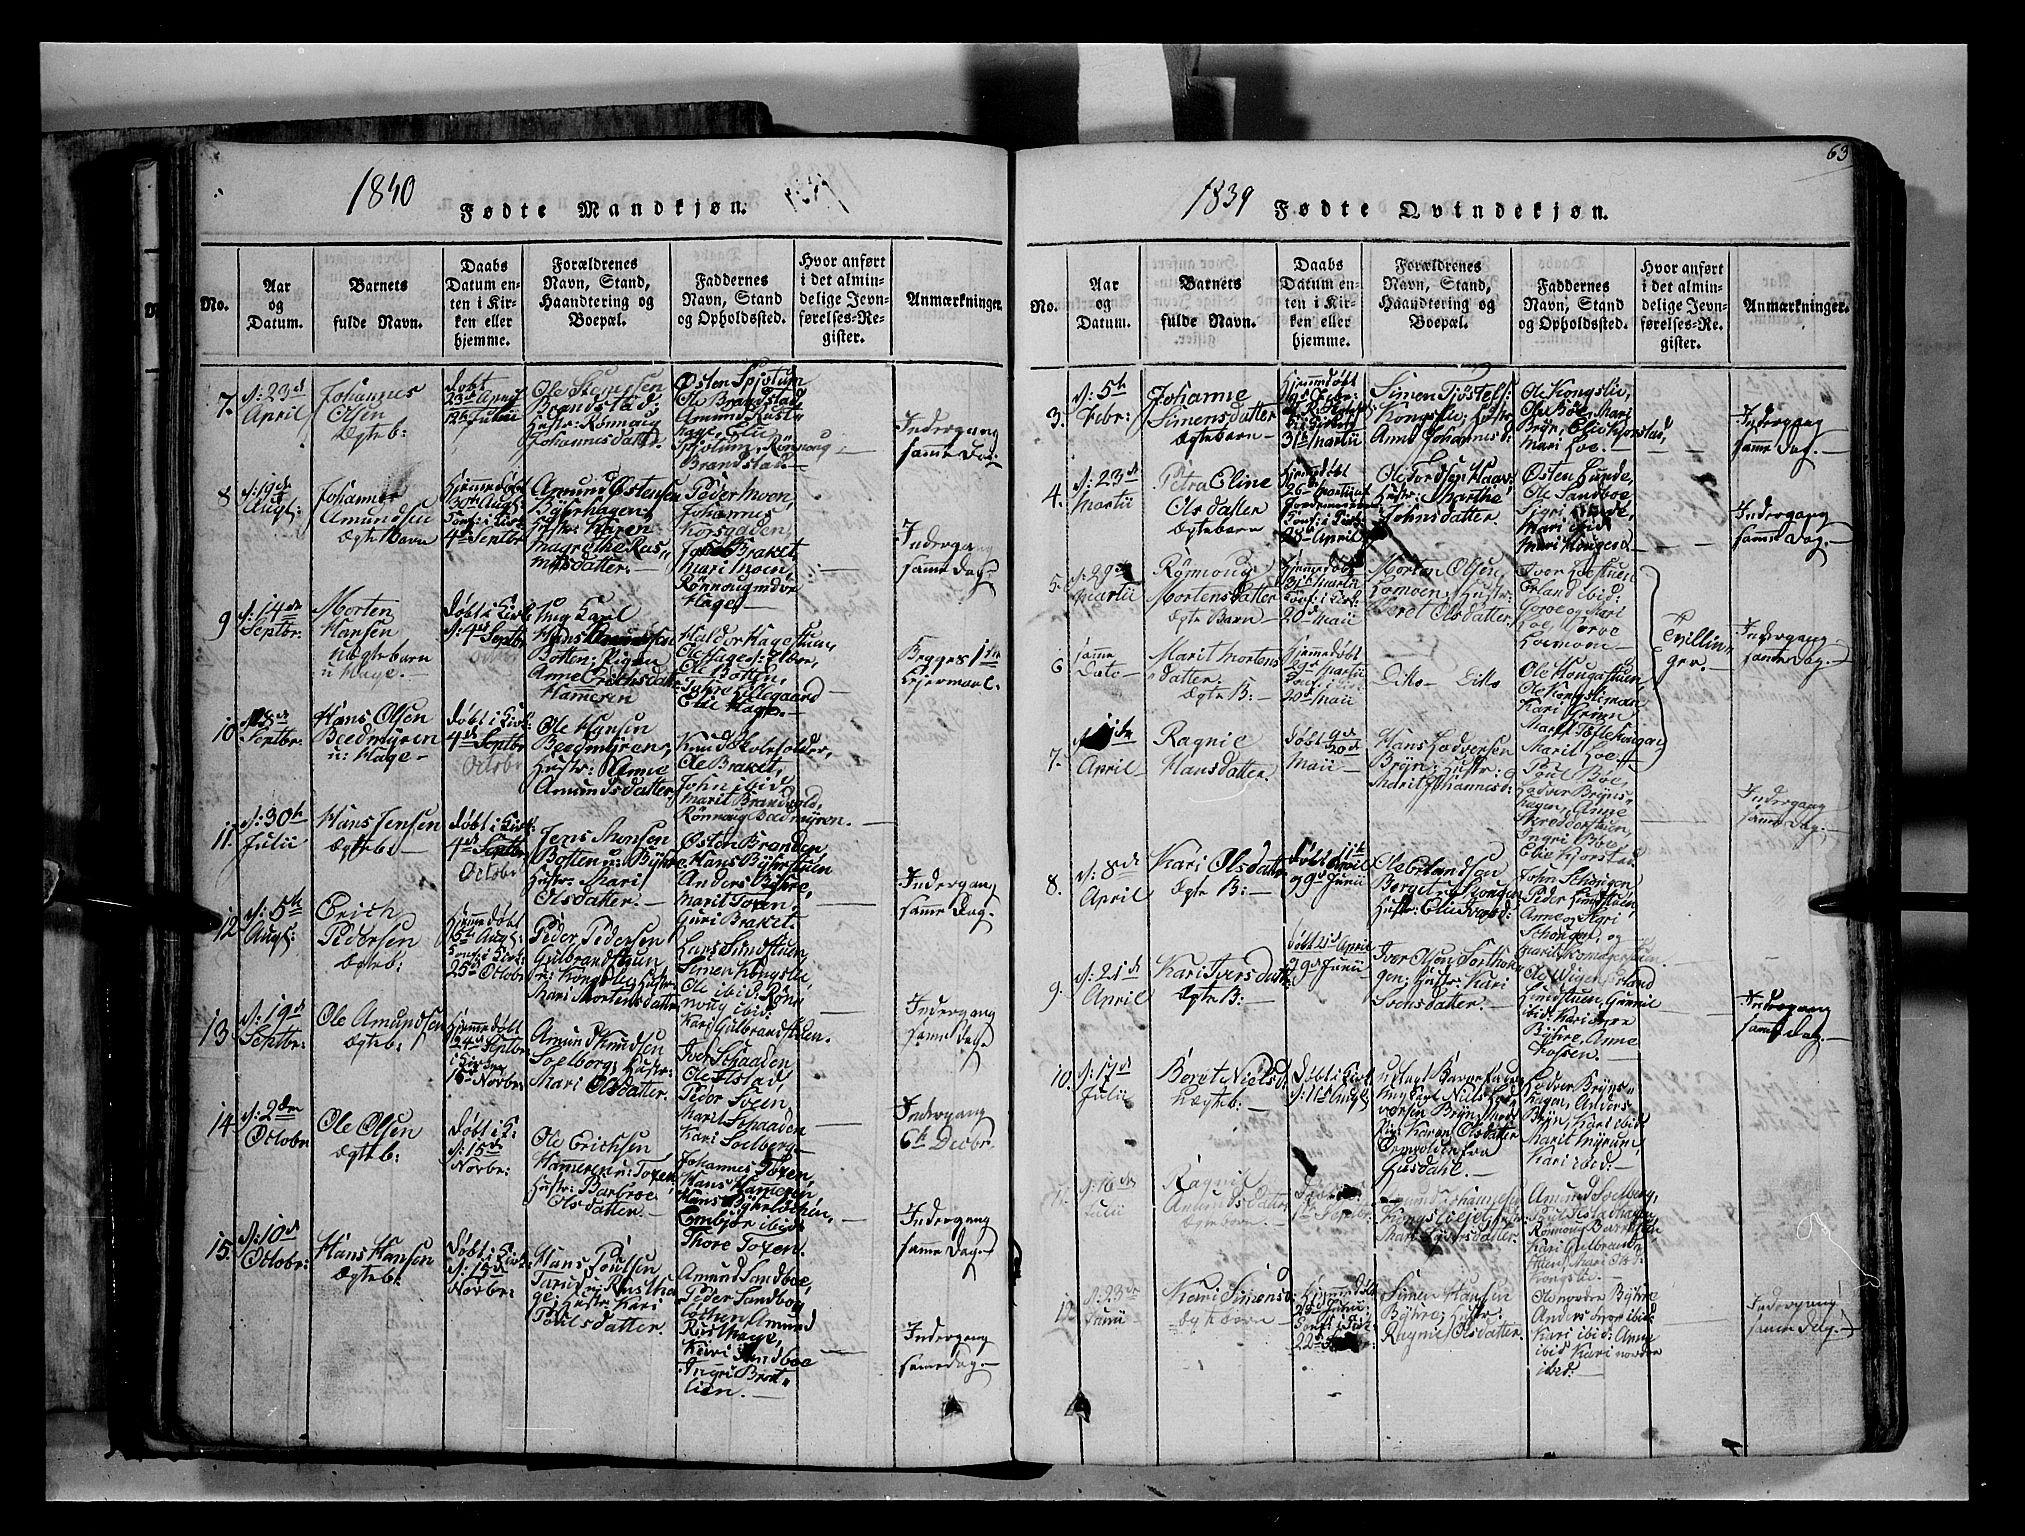 SAH, Fron prestekontor, H/Ha/Hab/L0004: Klokkerbok nr. 4, 1816-1850, s. 63